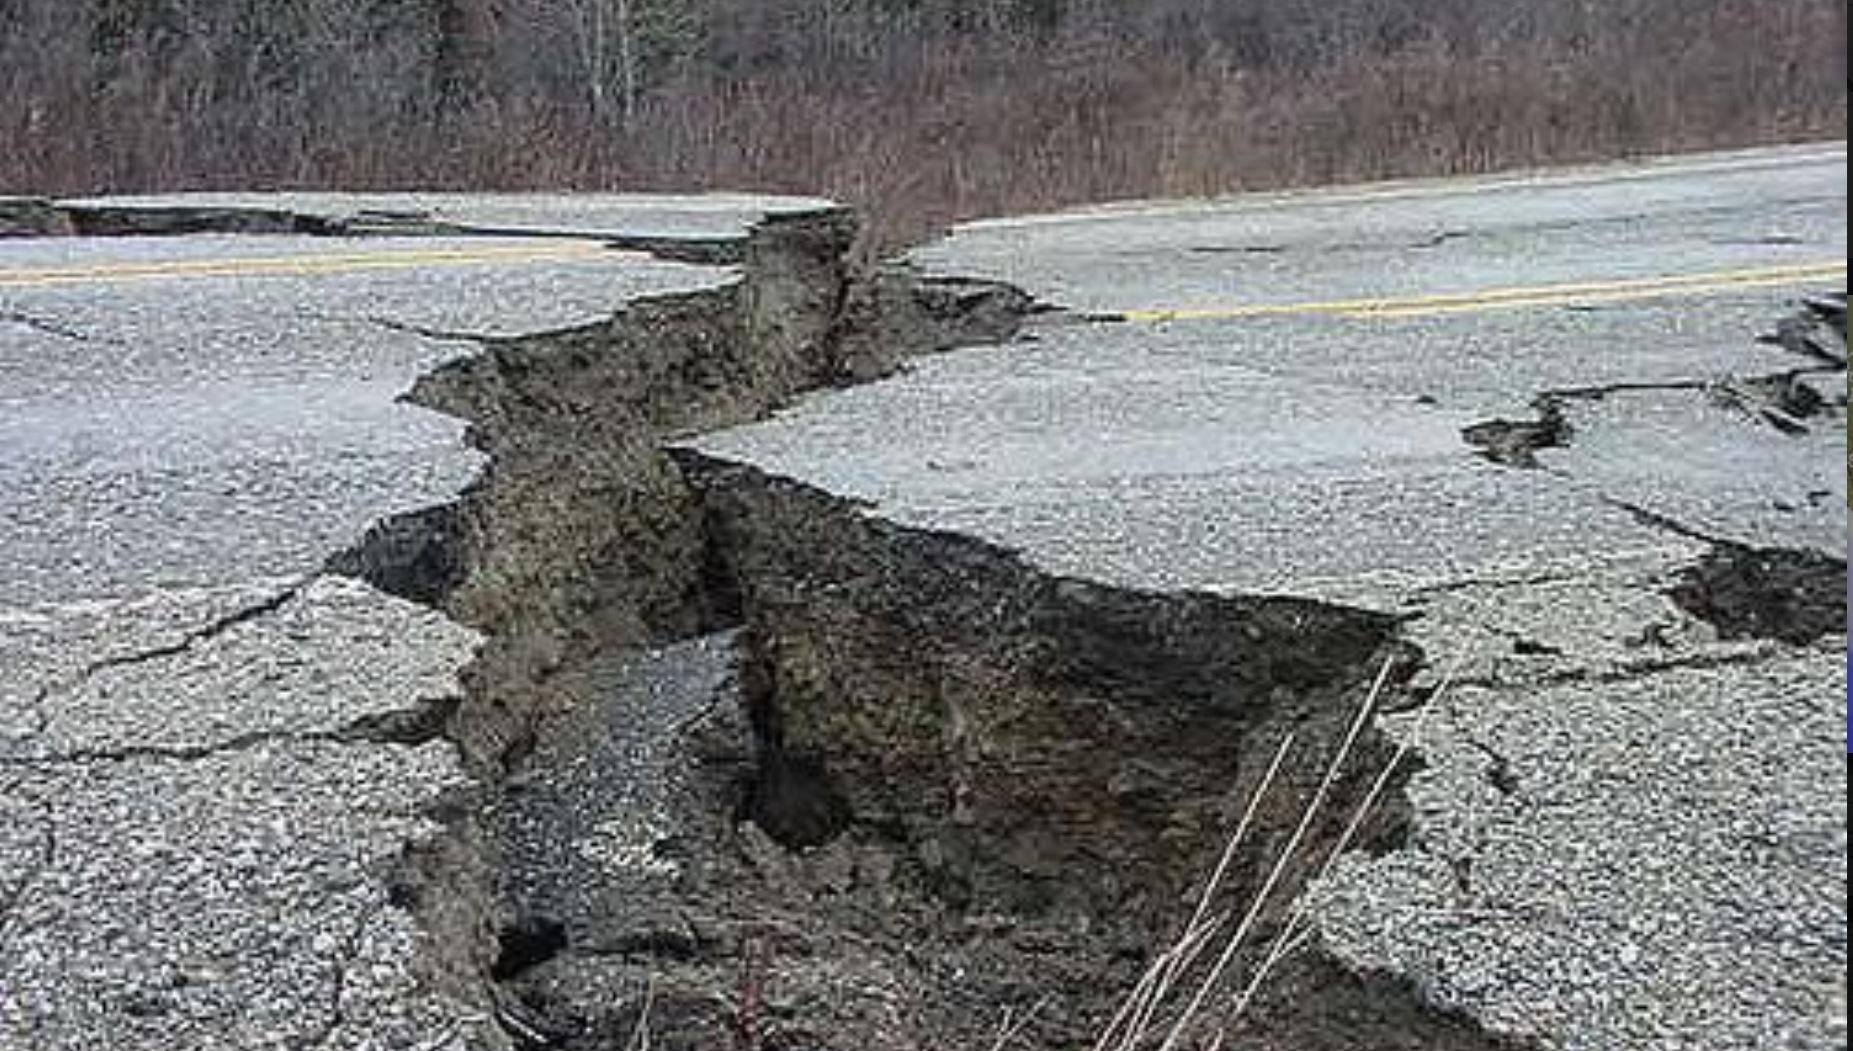 paura terremoto